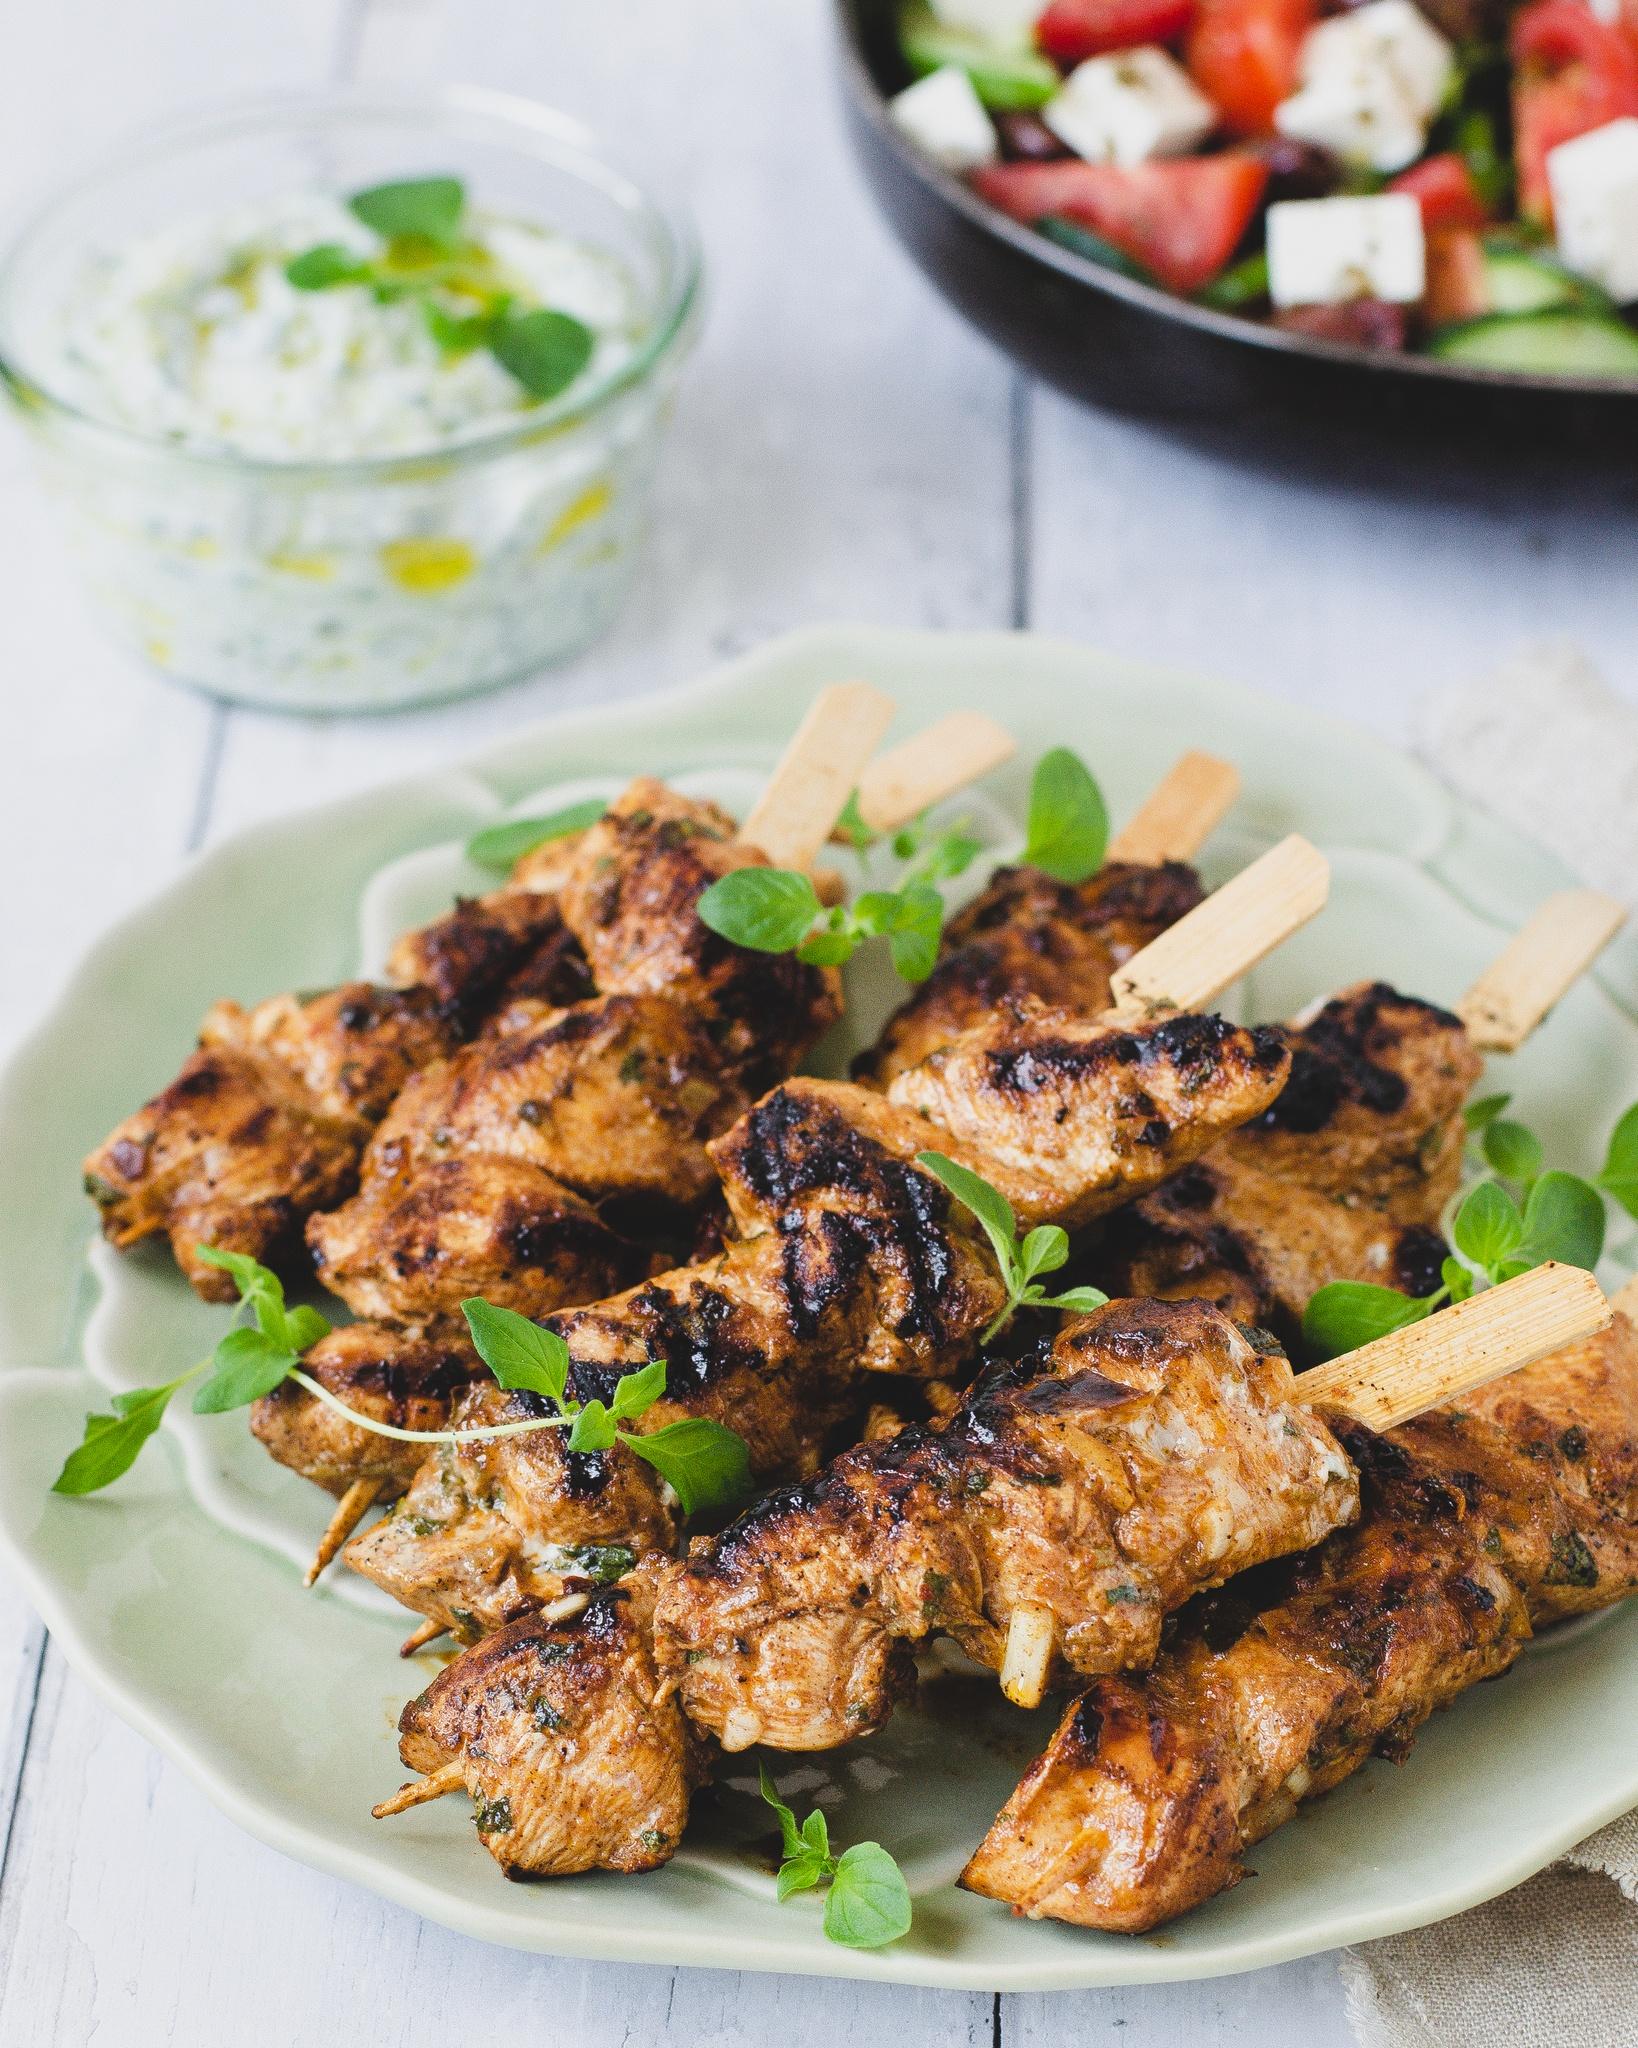 græsk kylling på spyd, med oregano